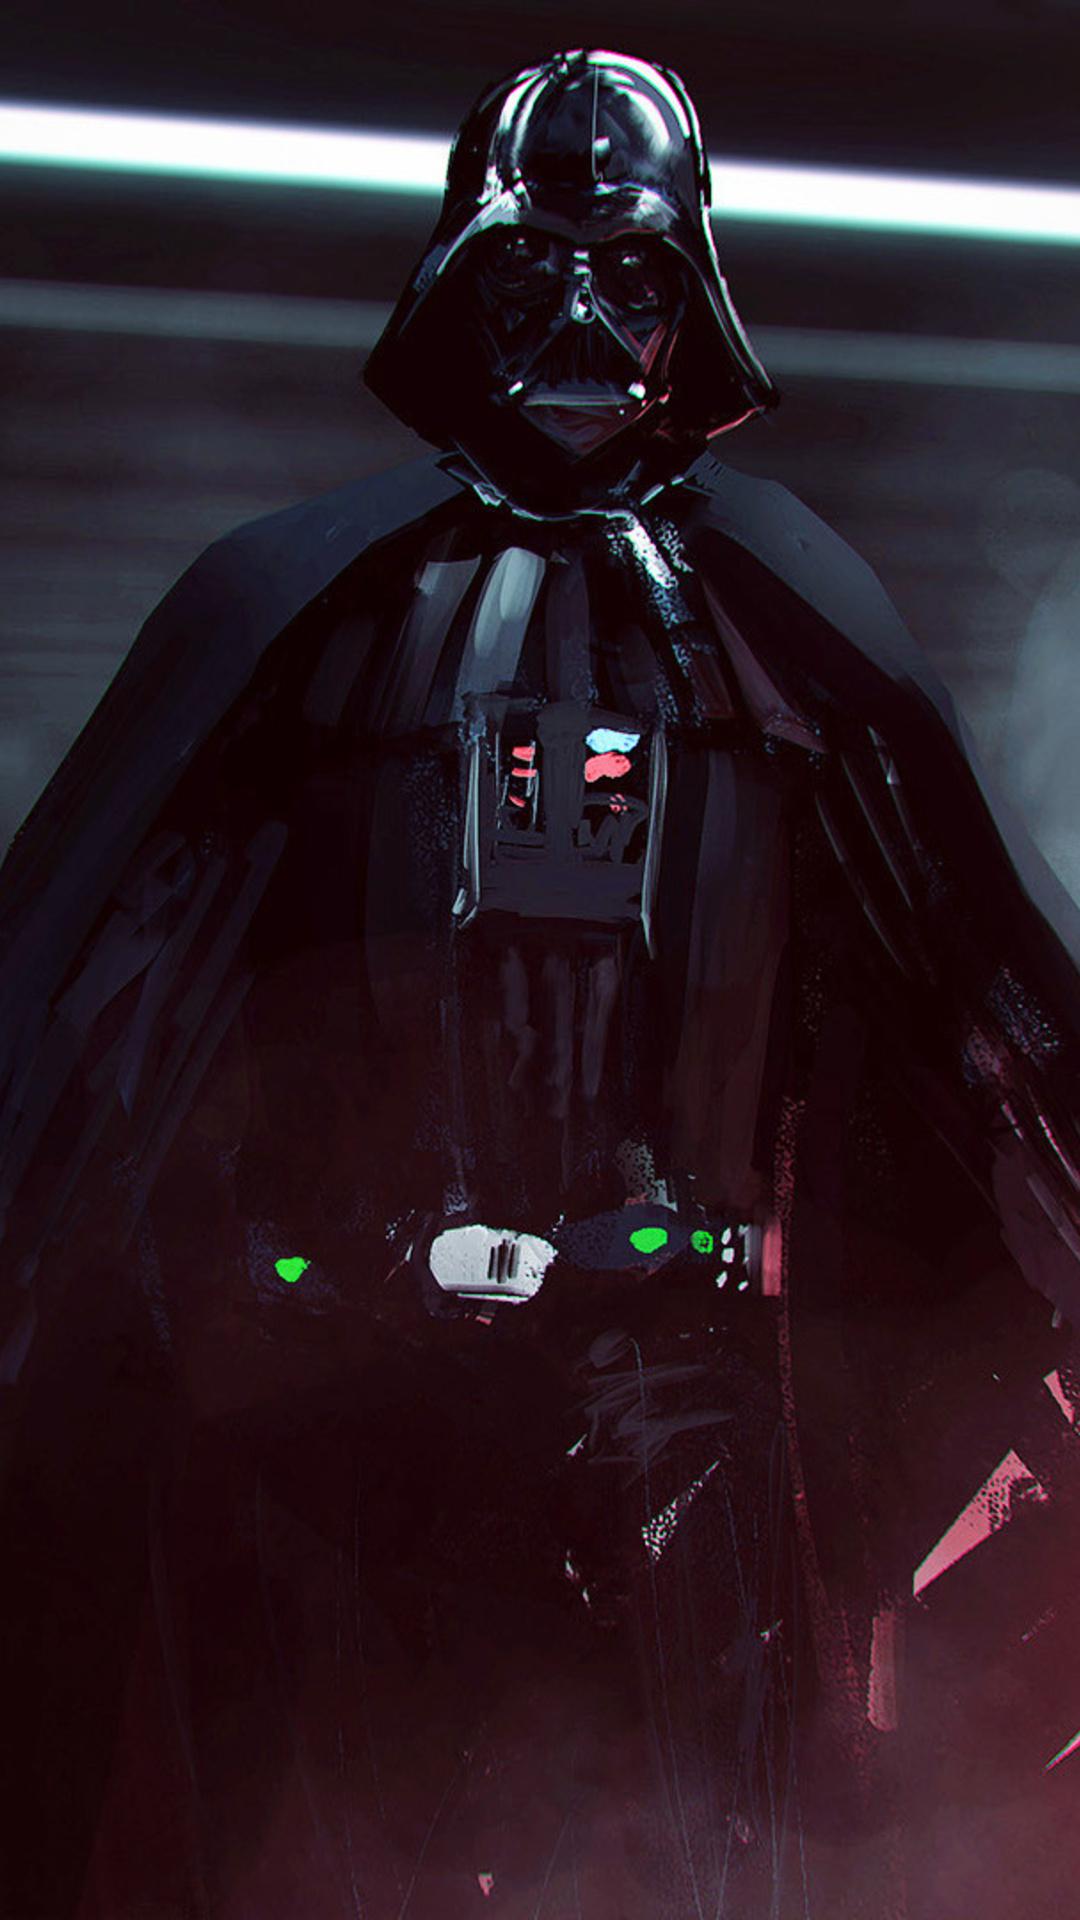 1080x1920 Darth Vader Star Wars Battlefront 2 Concept Art